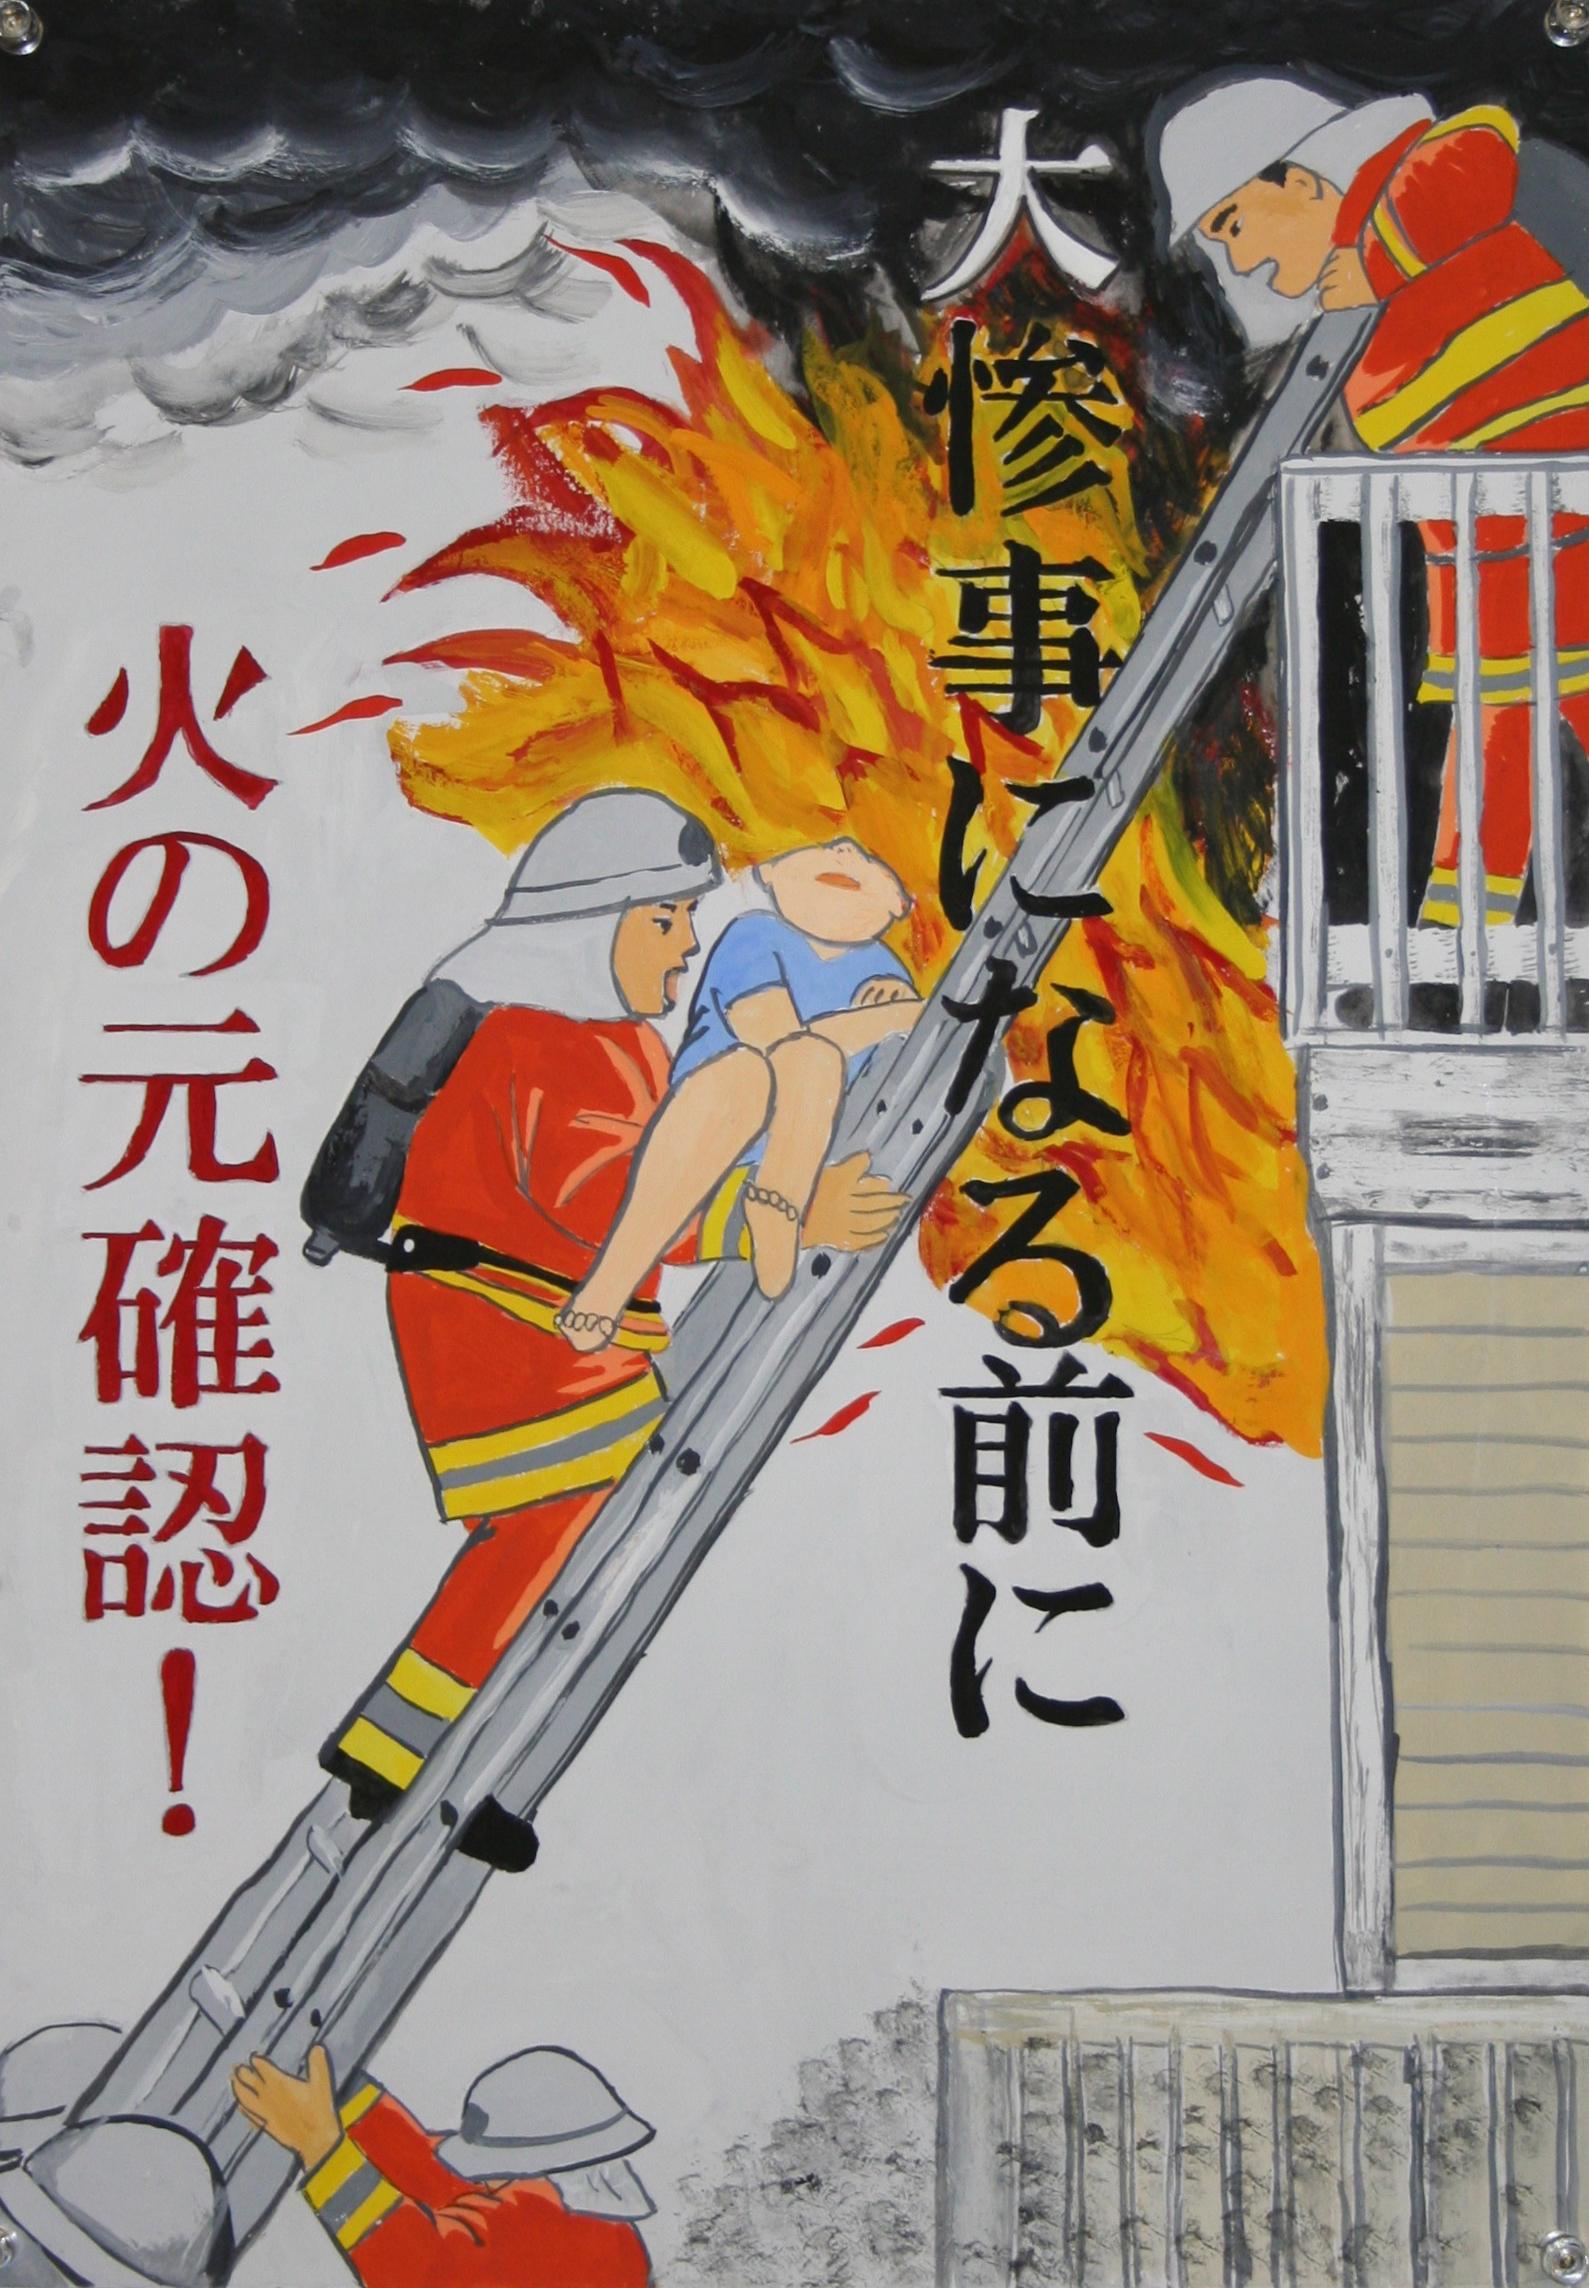 最優秀賞(中学生の部)